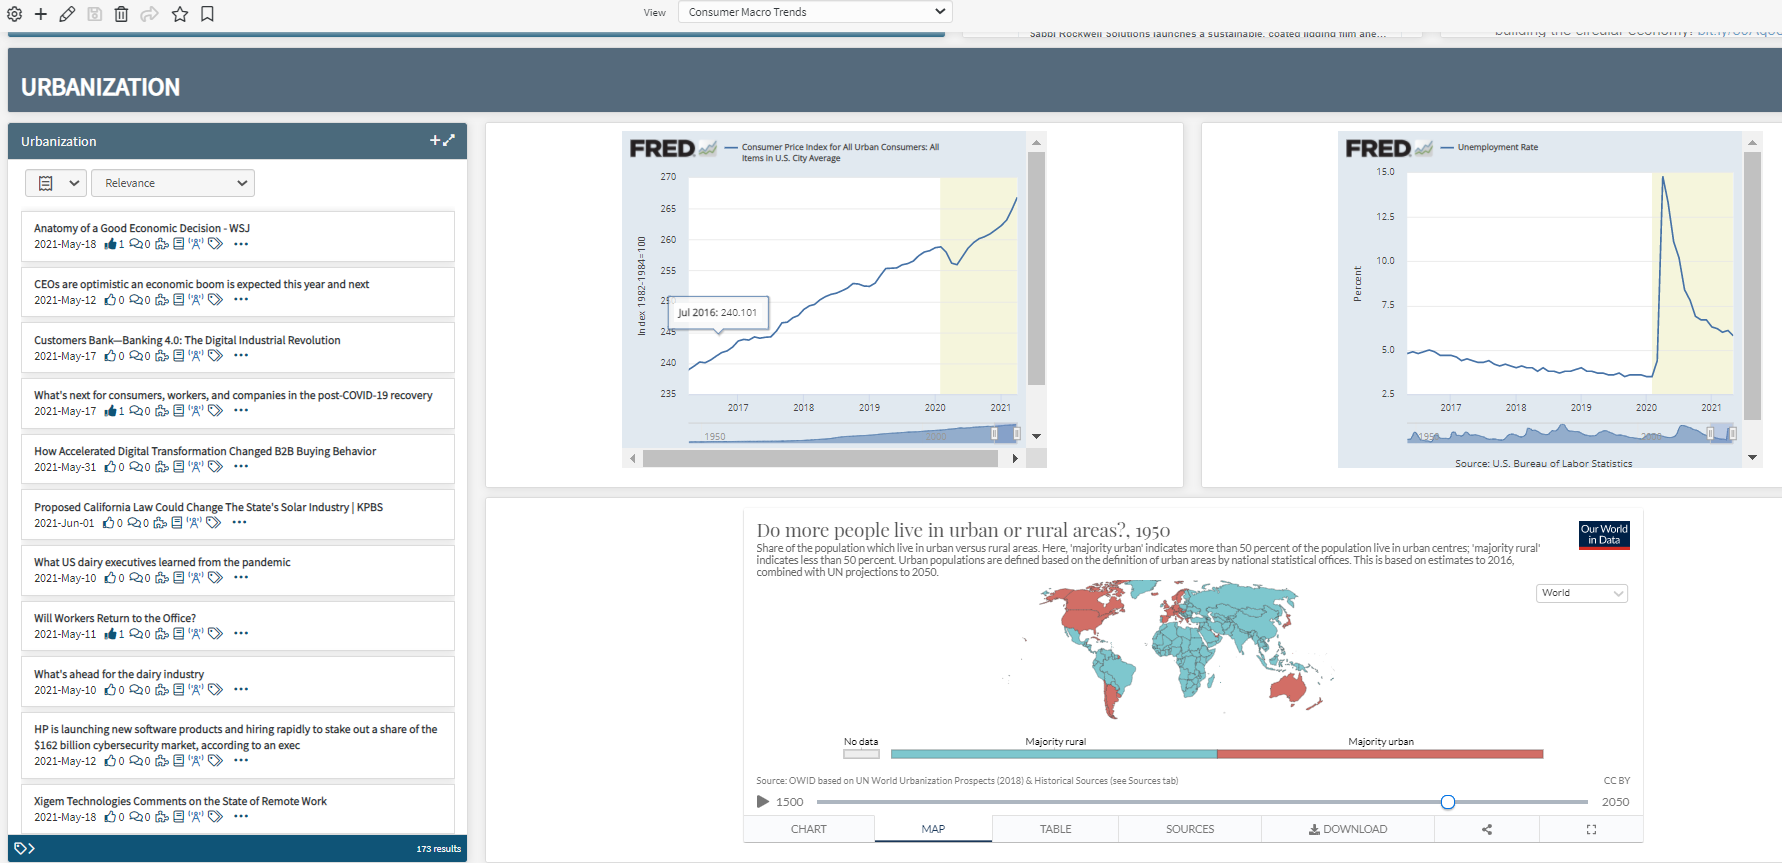 Consumer Macro Trends - Urbanization